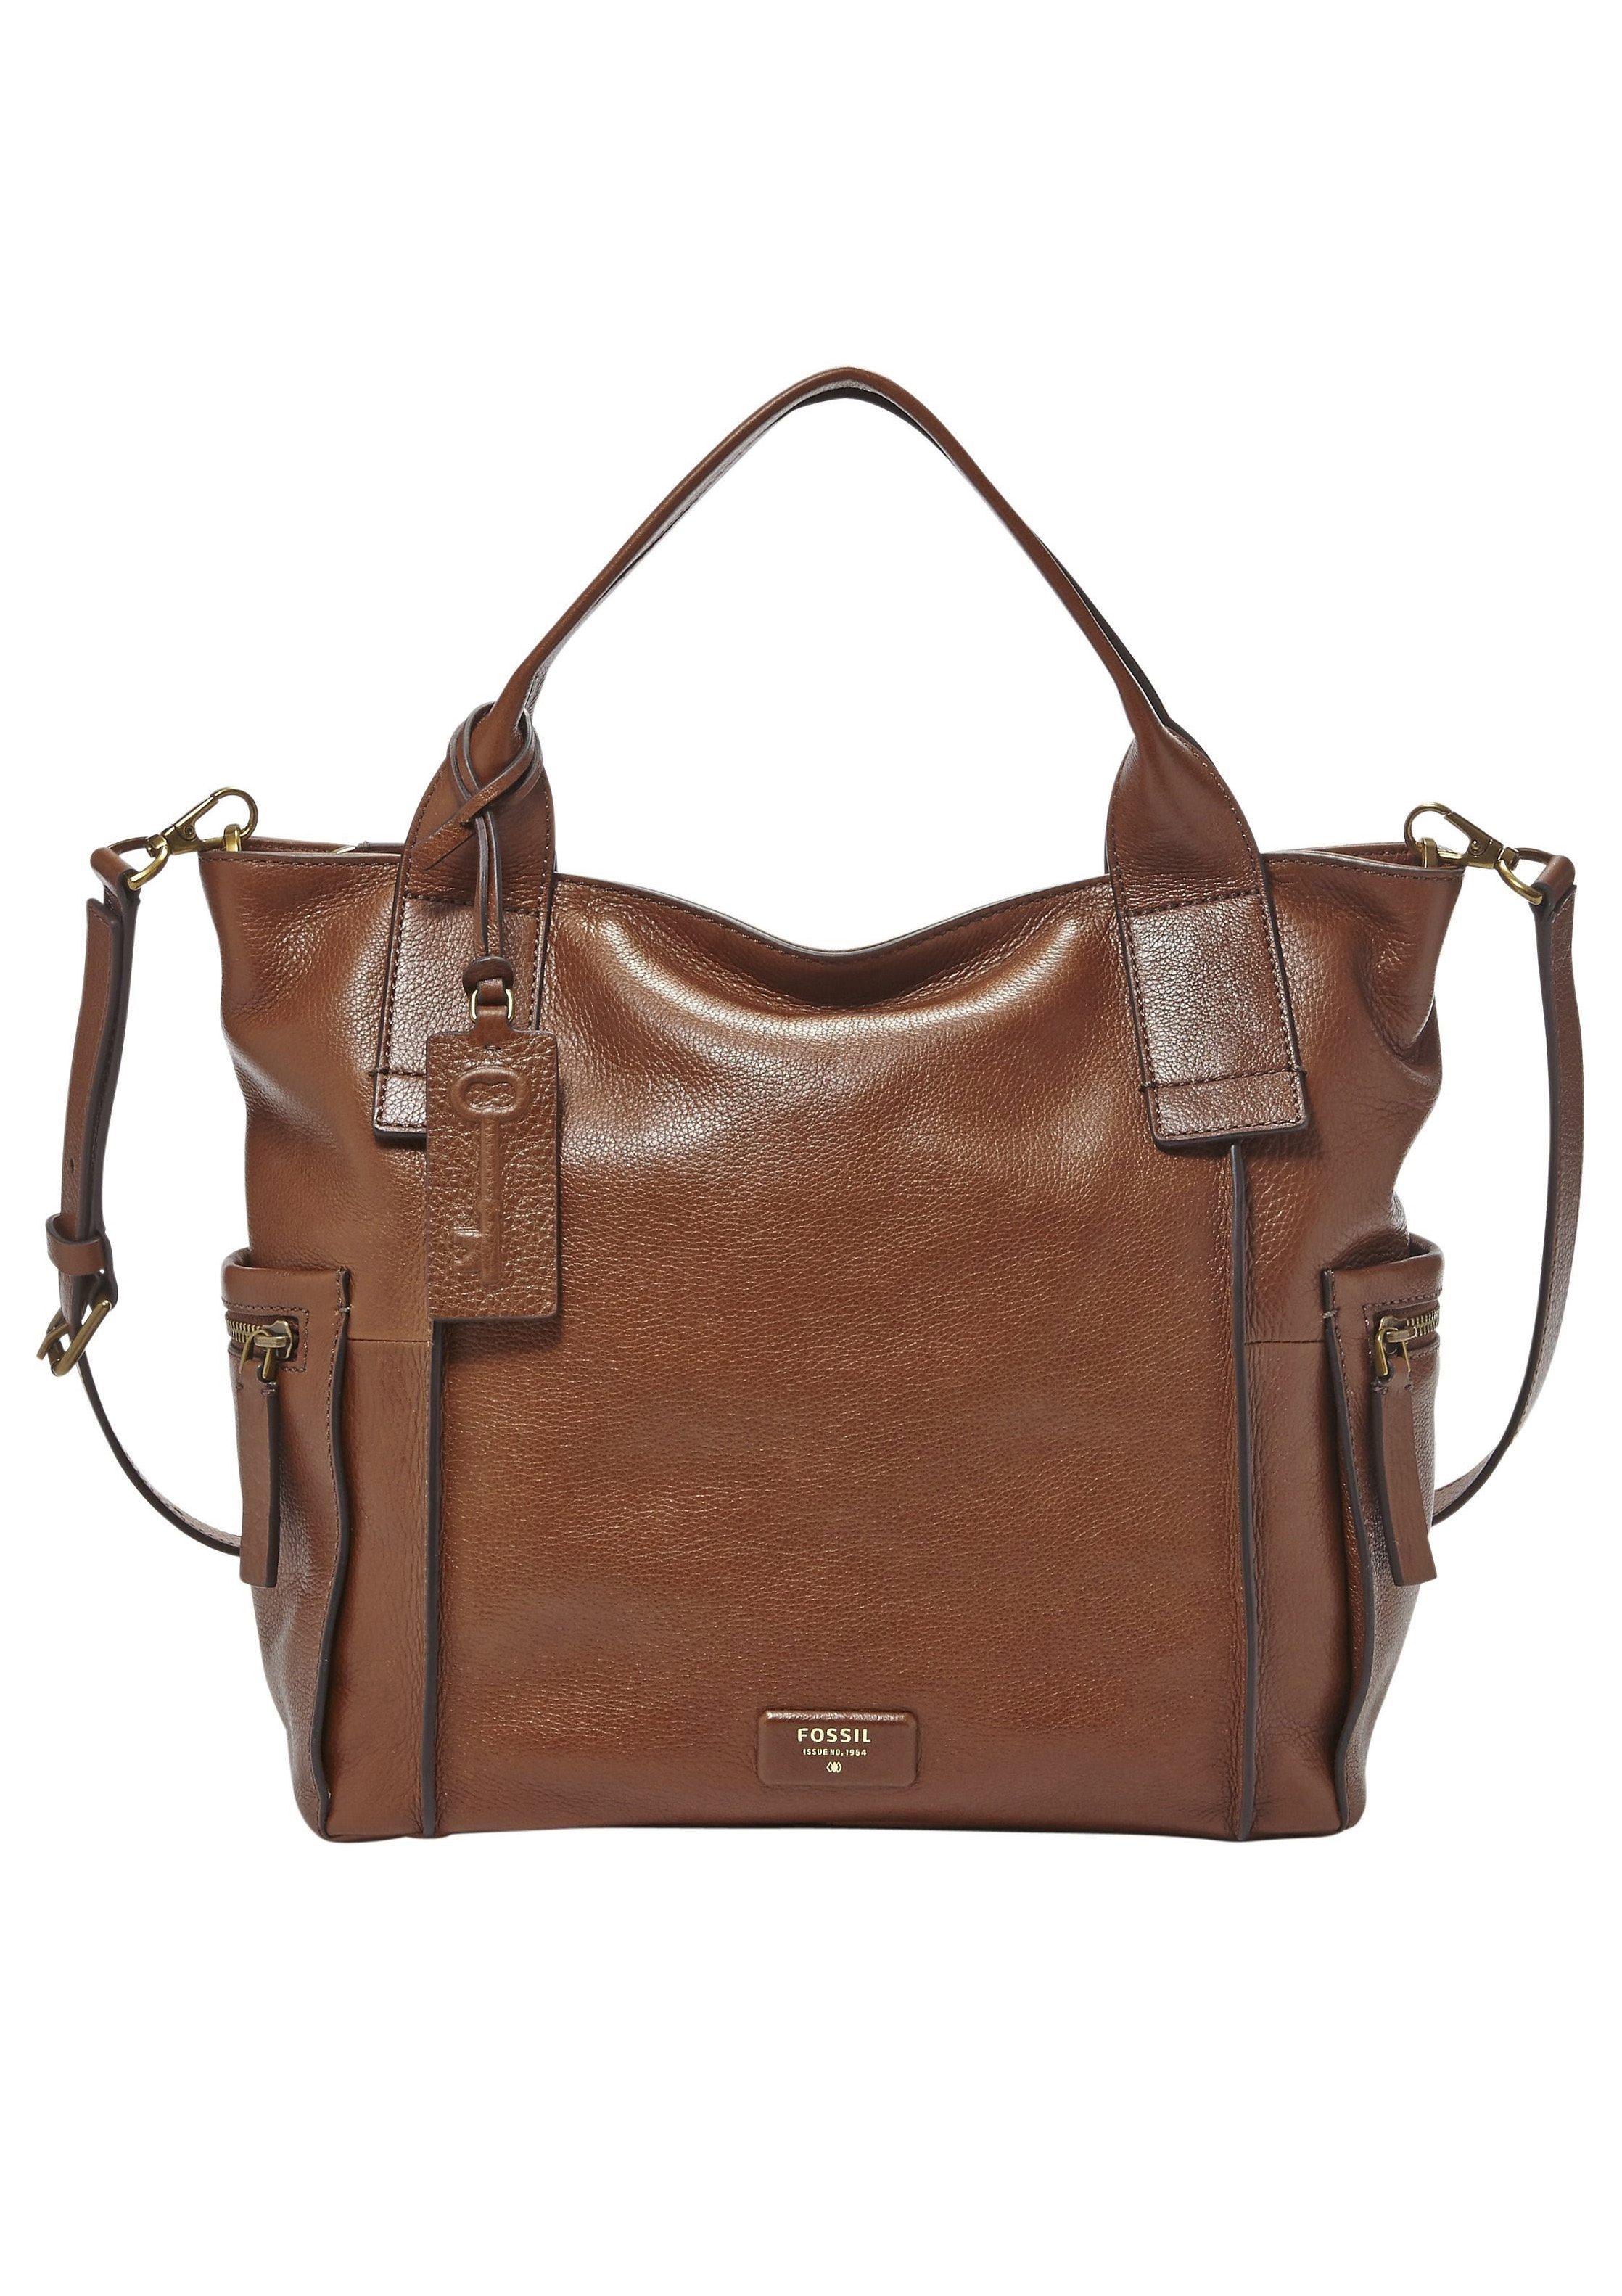 Fossil Handtasche »EMERSON SATCHEL« aus Leder